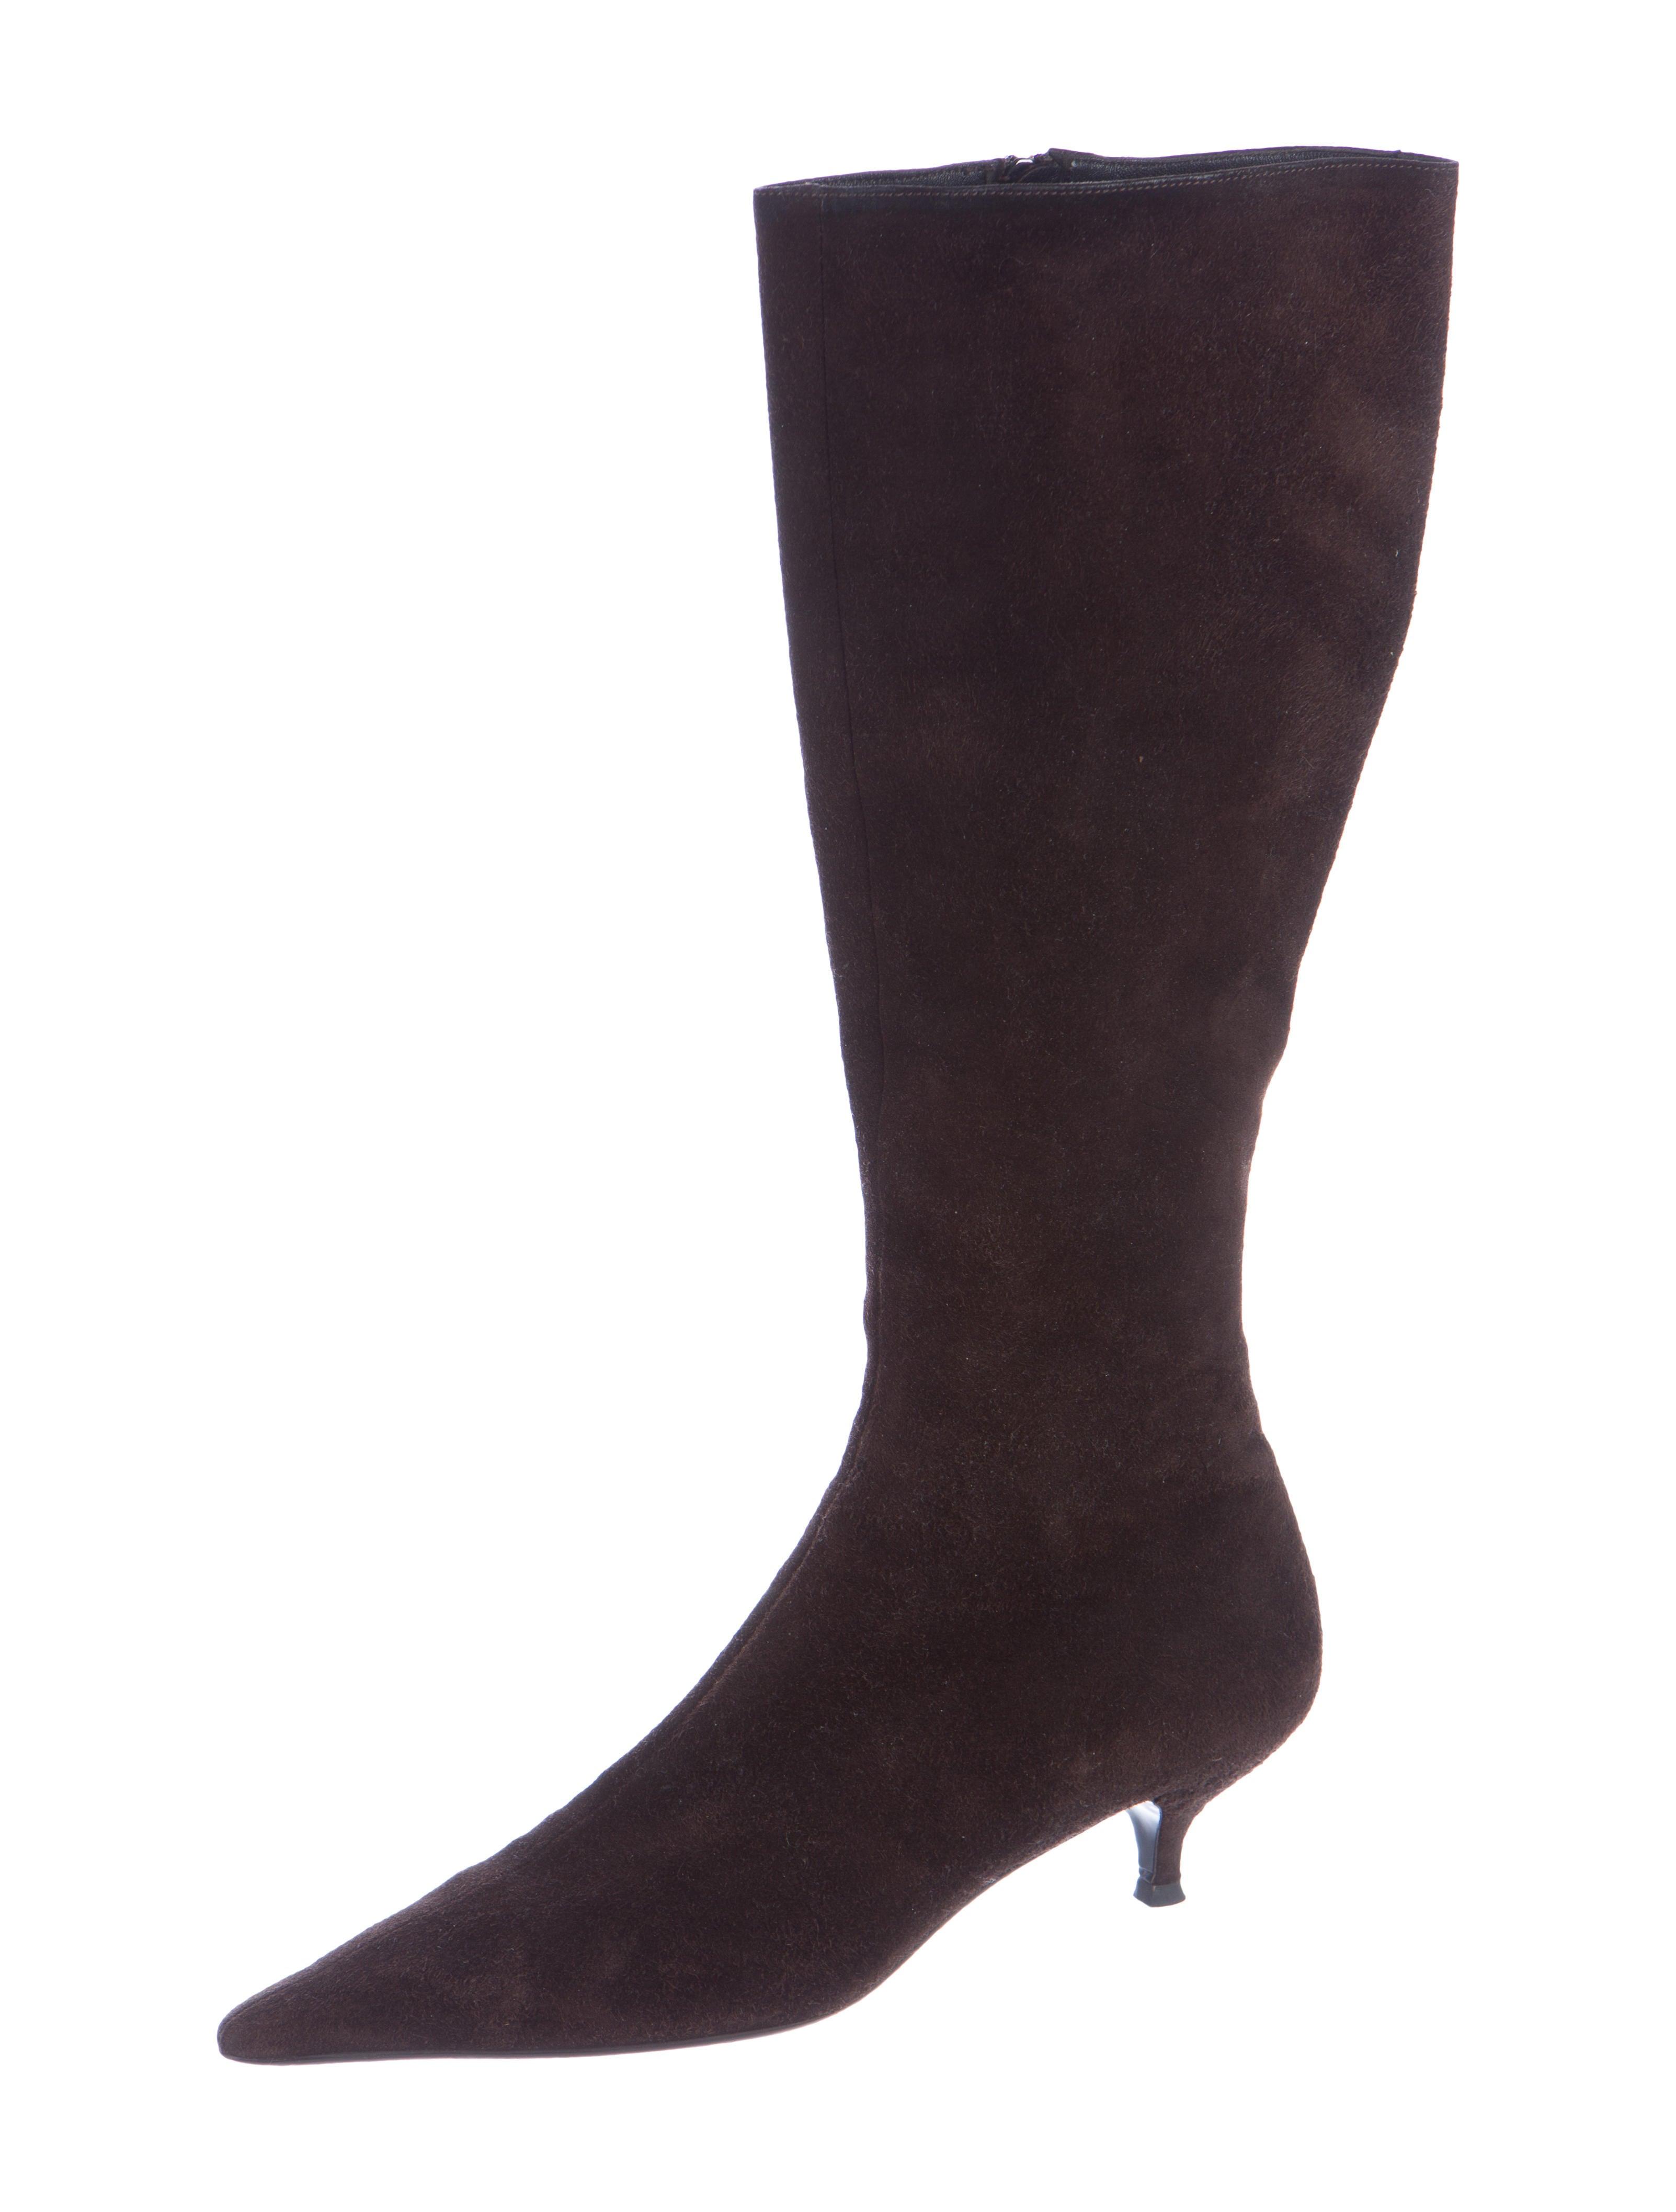 prada suede knee high boots shoes pra120140 the realreal